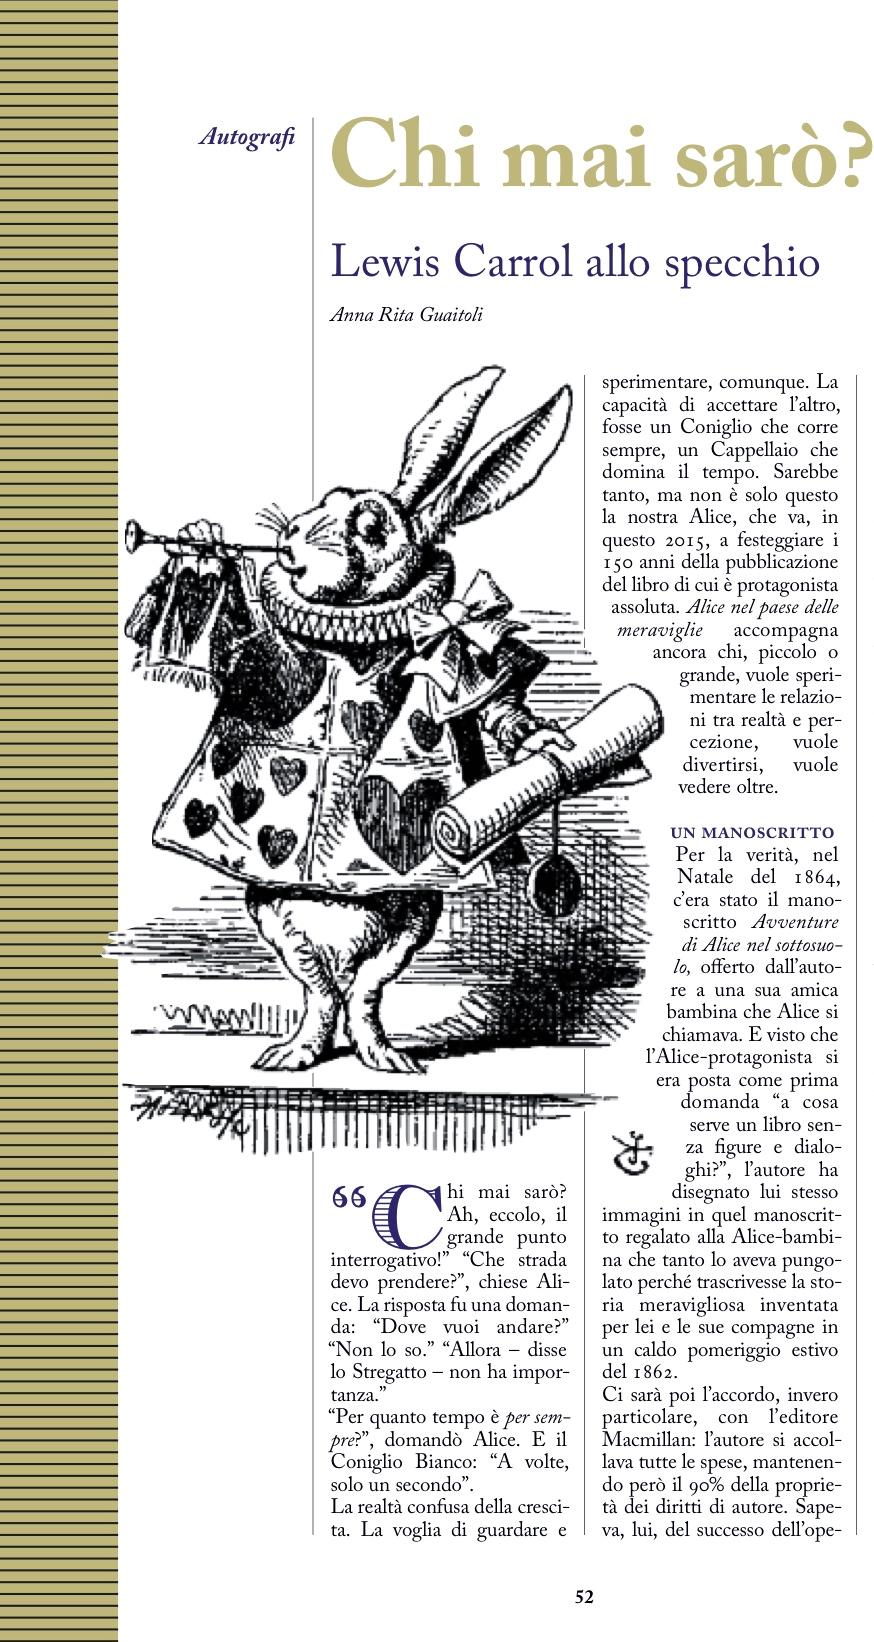 Carrol, Charta n. 138